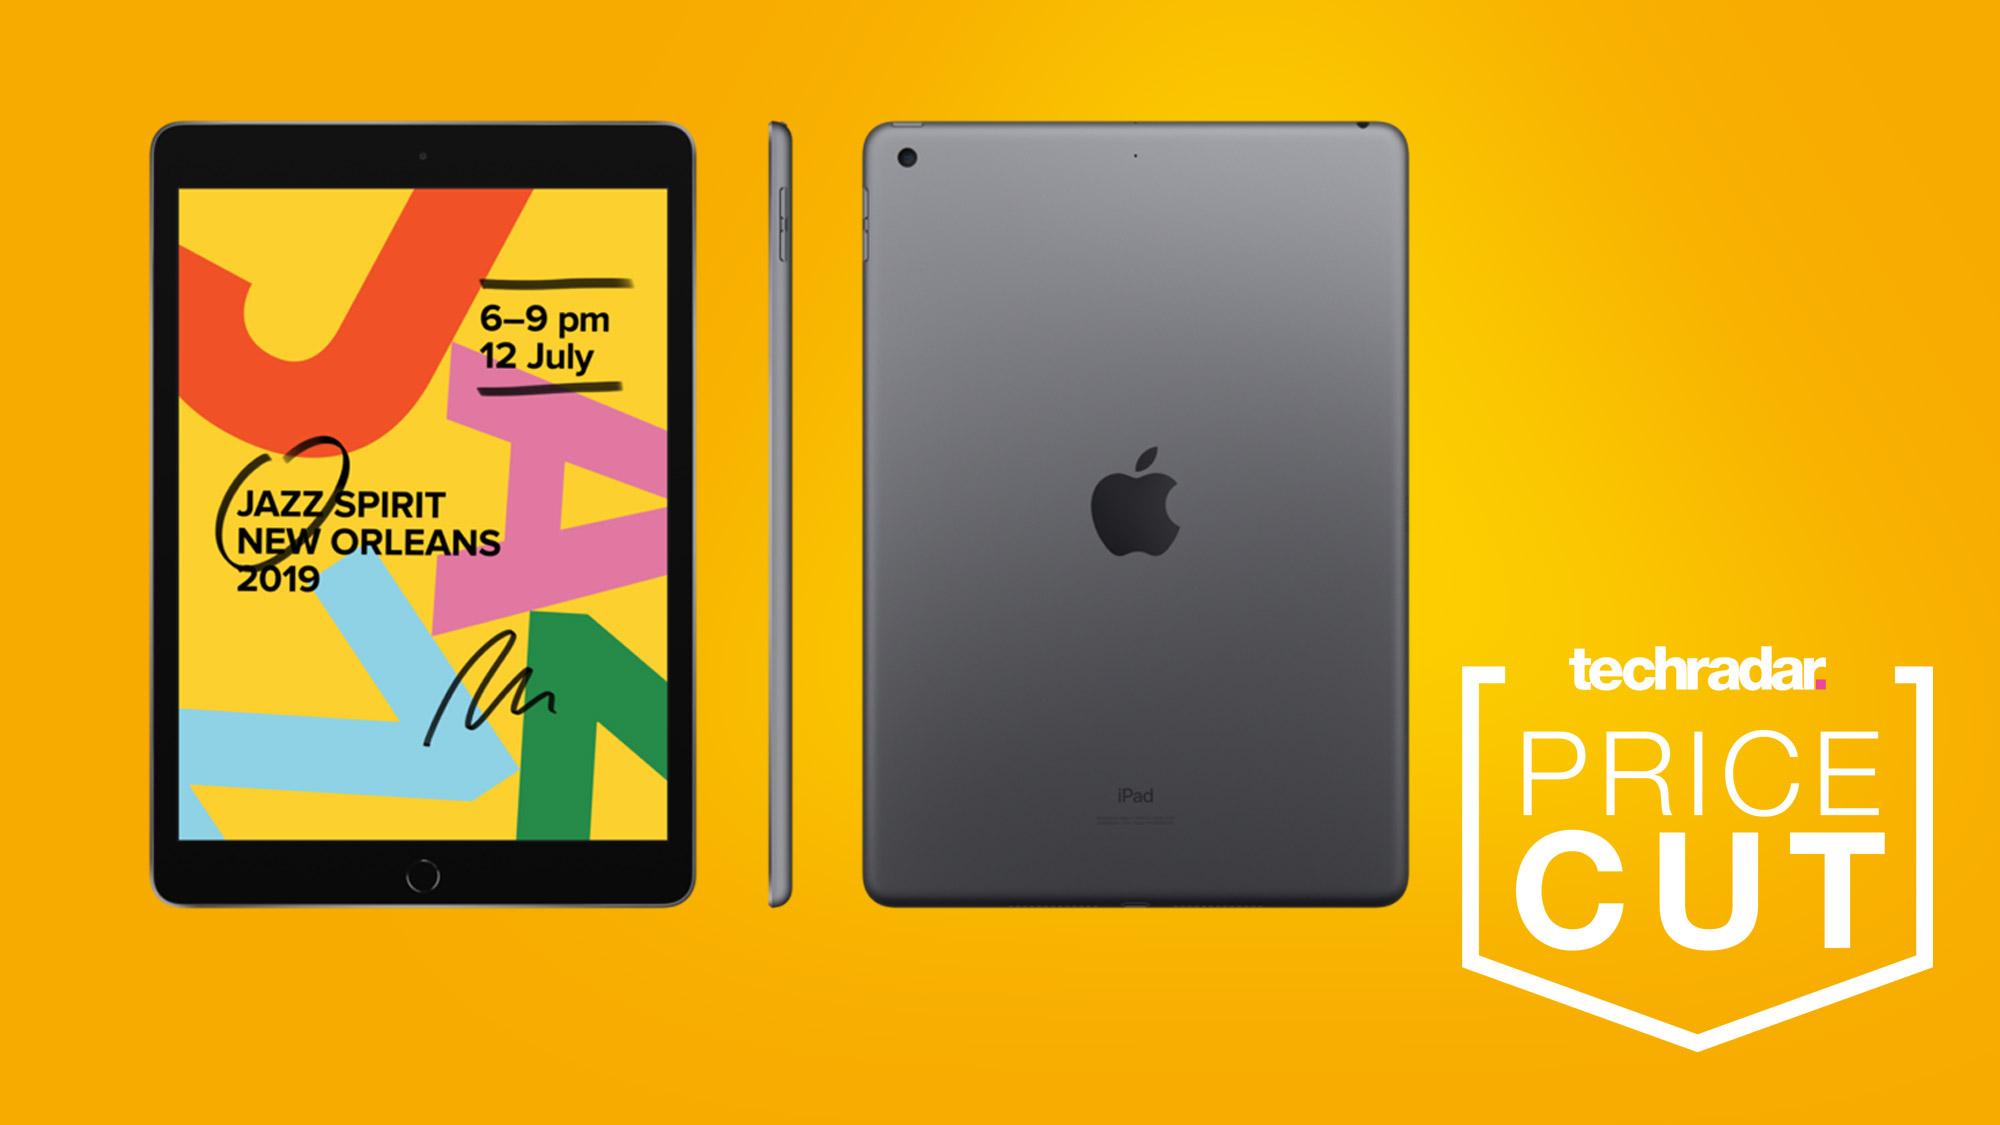 iPad deal alert: the latest model Apple iPad gets an $80 price cut